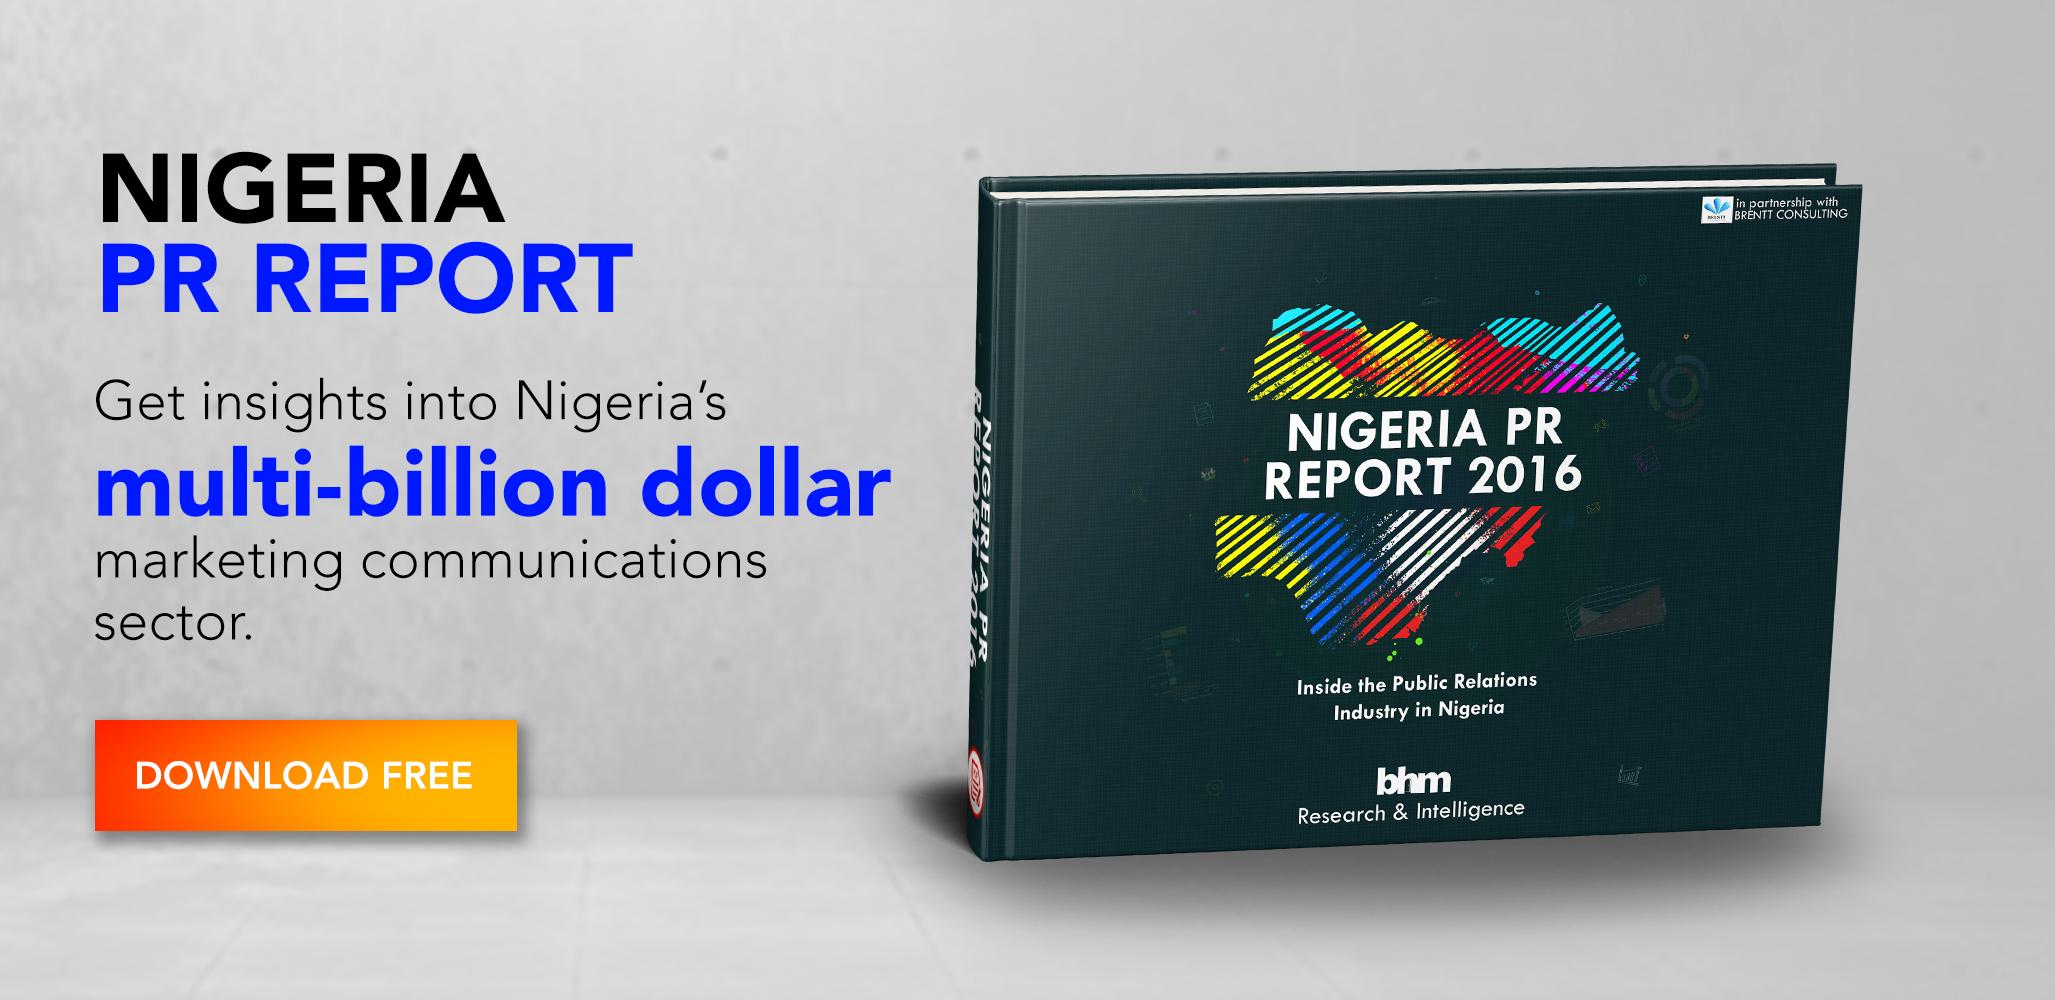 Nigeria PR Industry: 13 Quick Insights From The Nigeria PR Report 2016